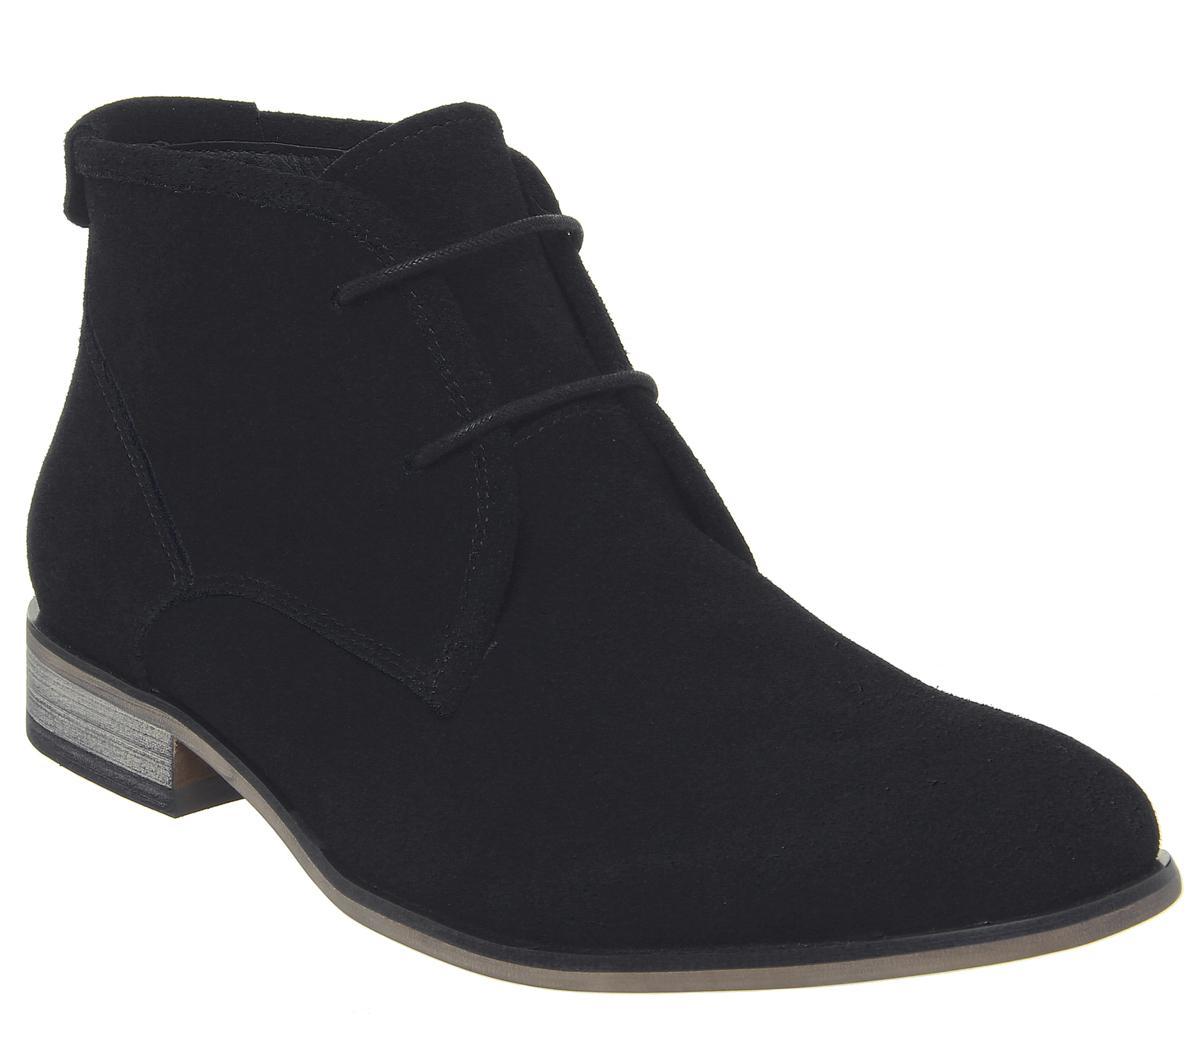 Barker Chukka Boots